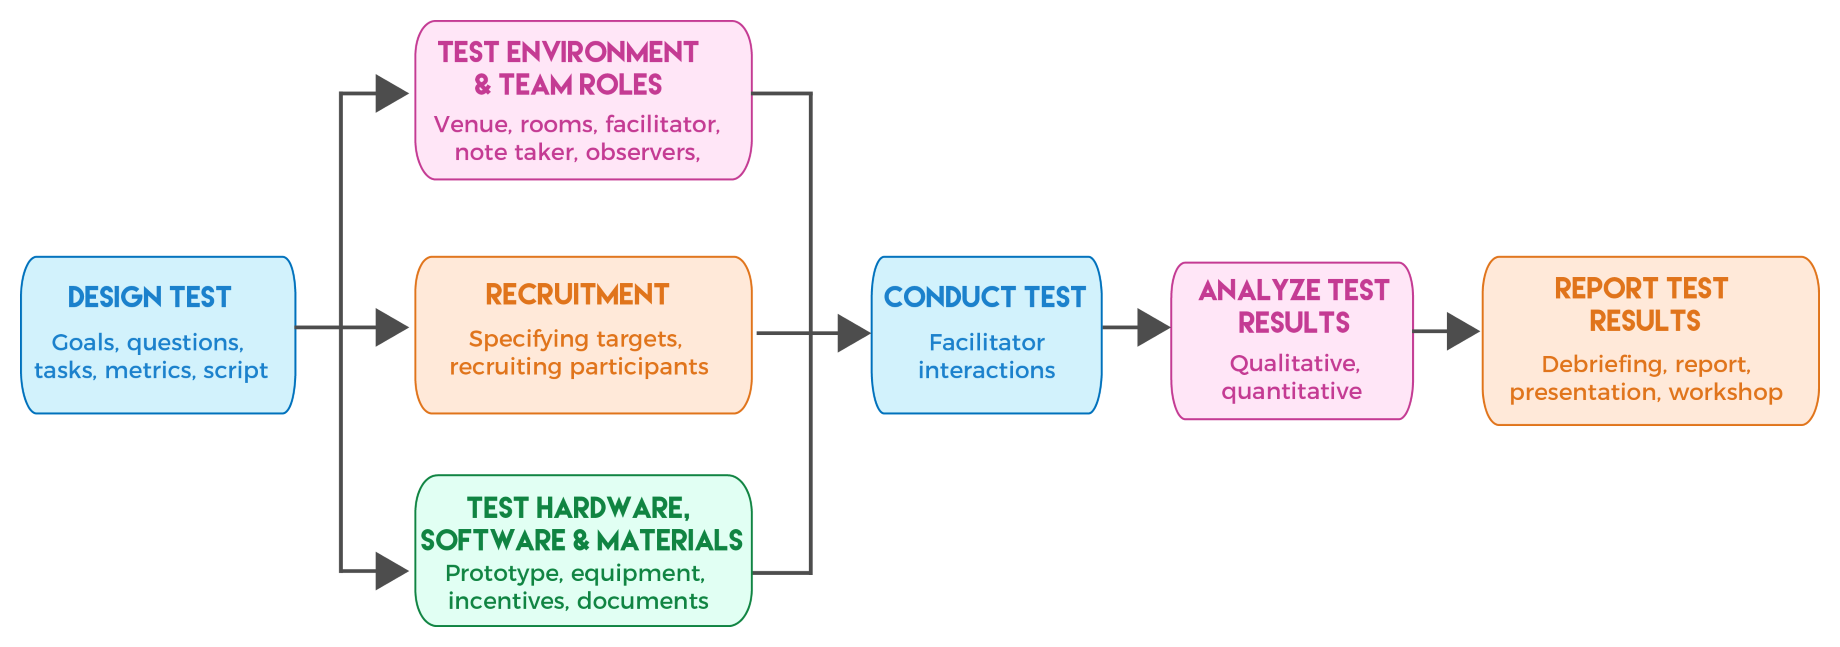 Usability test process